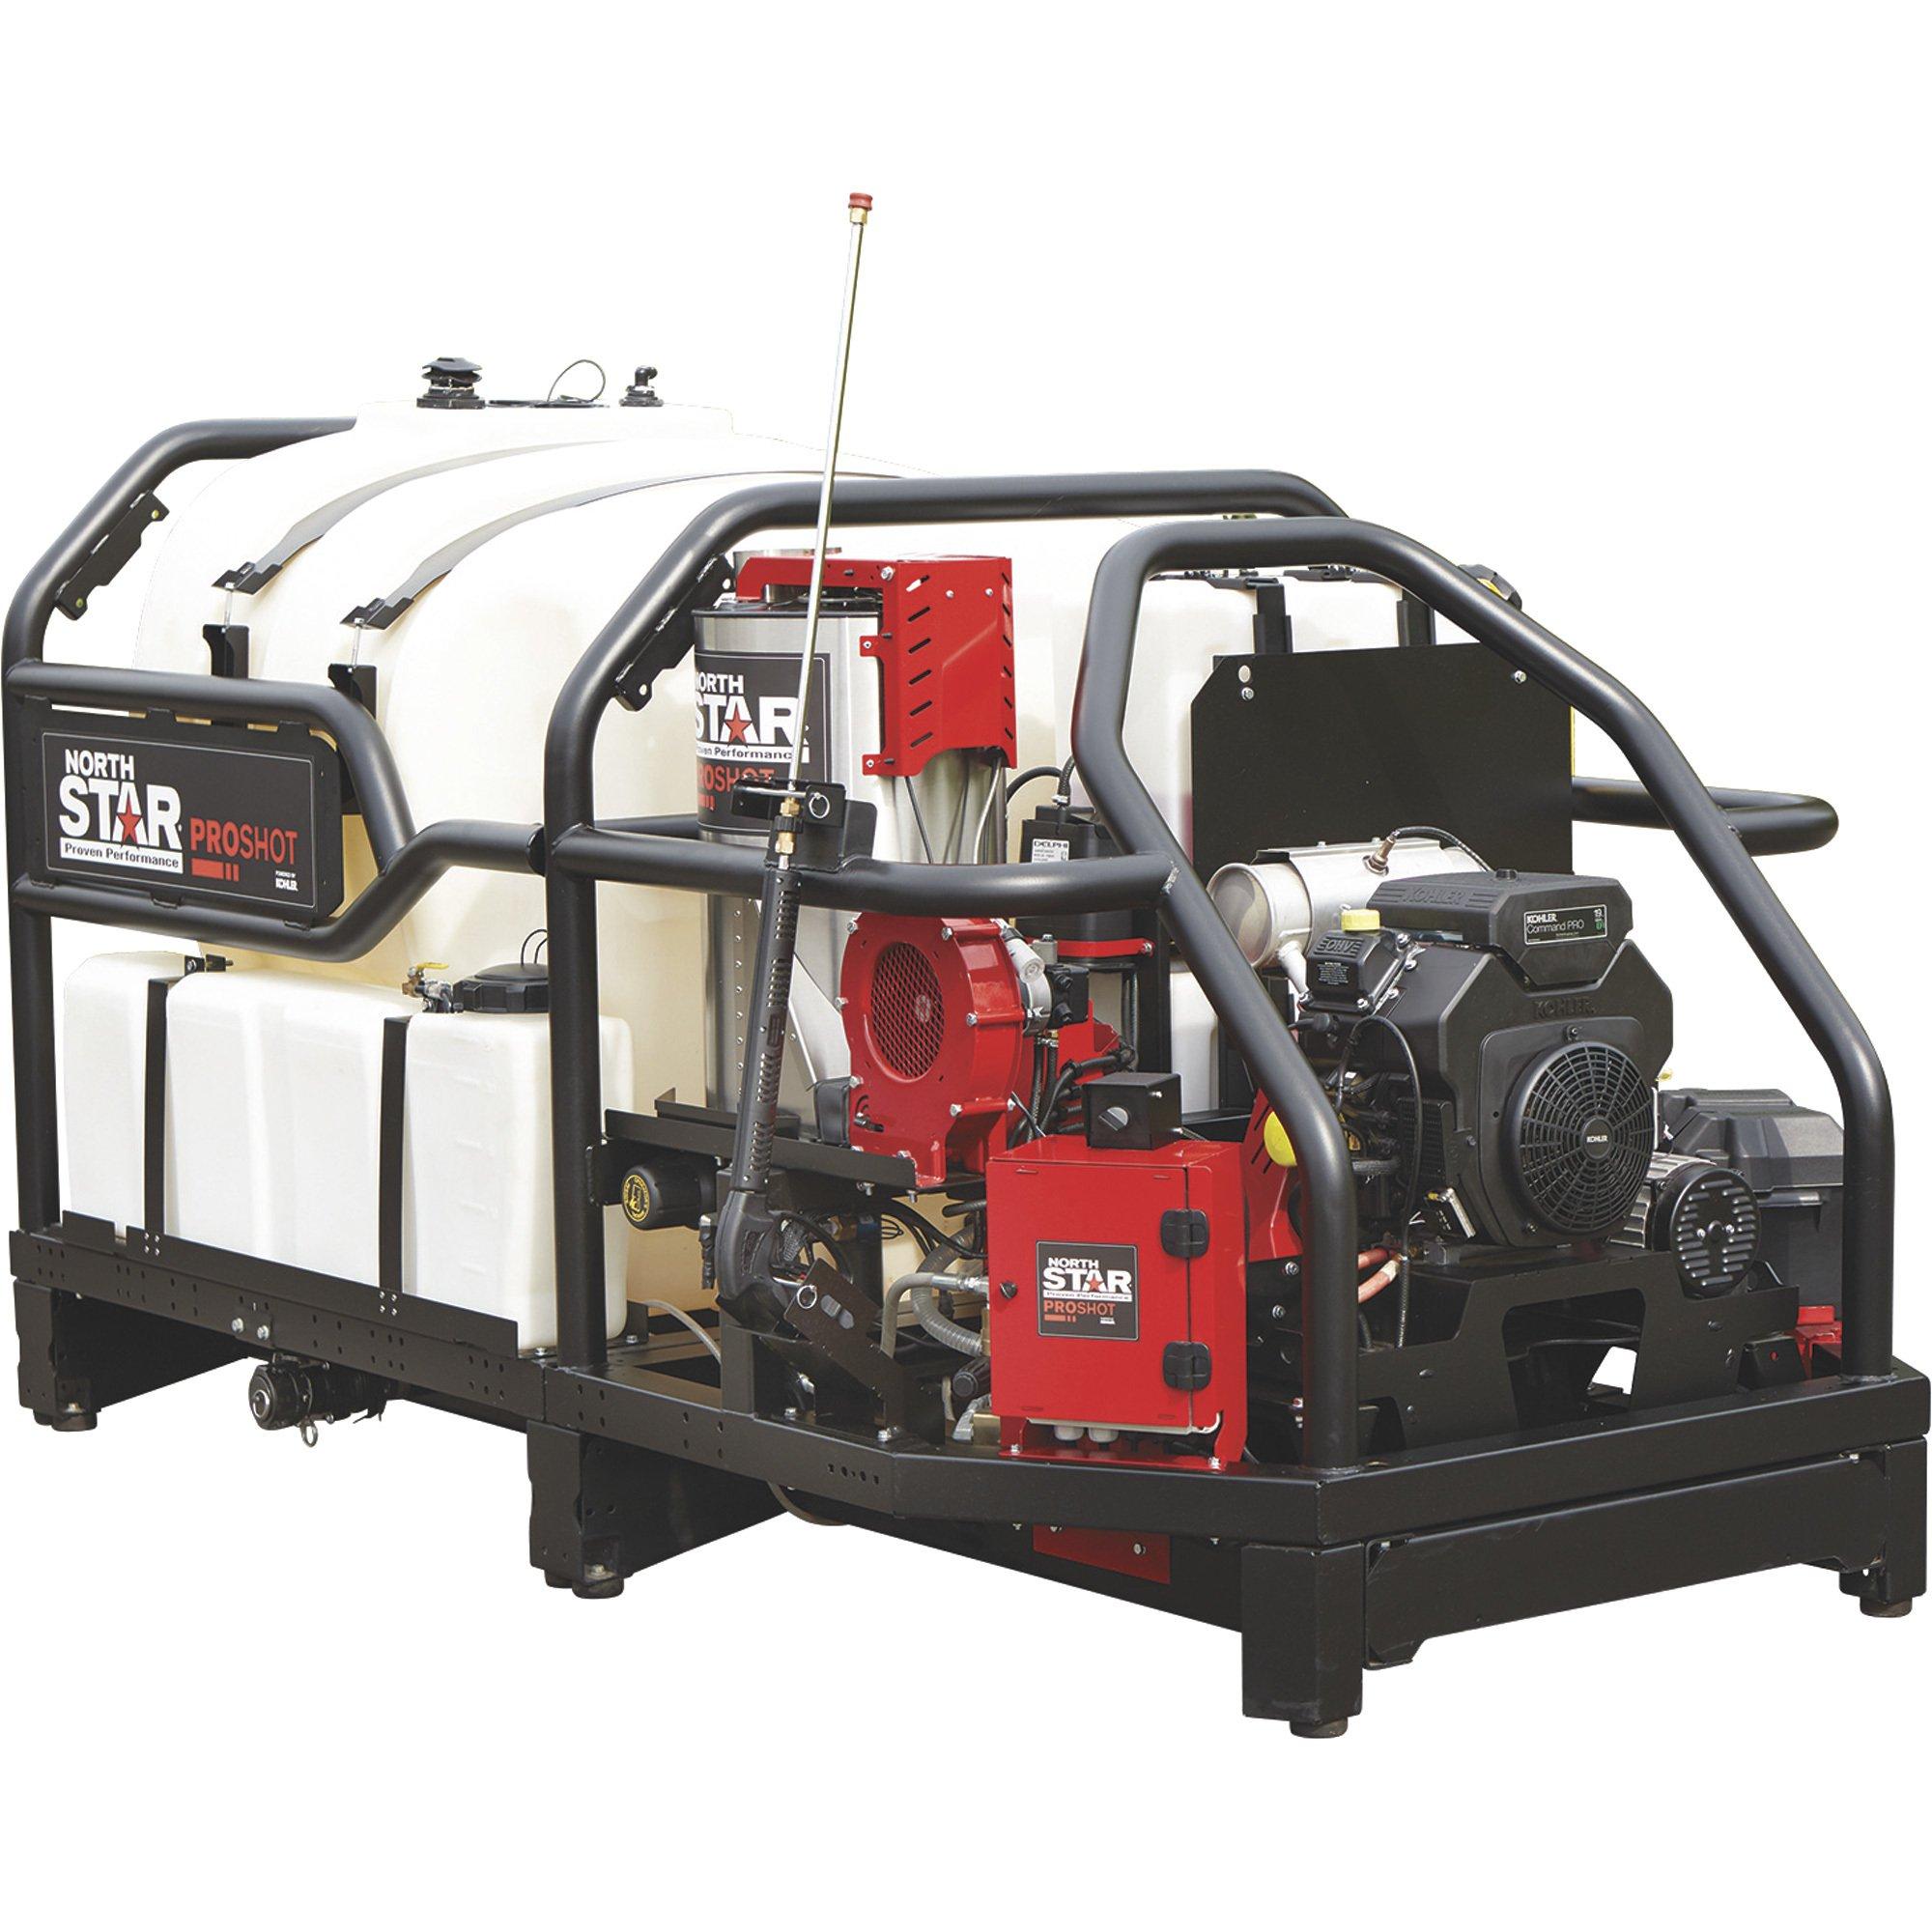 Steam Brite: Carpet Cleaning Machines, Truck Mount Carpet